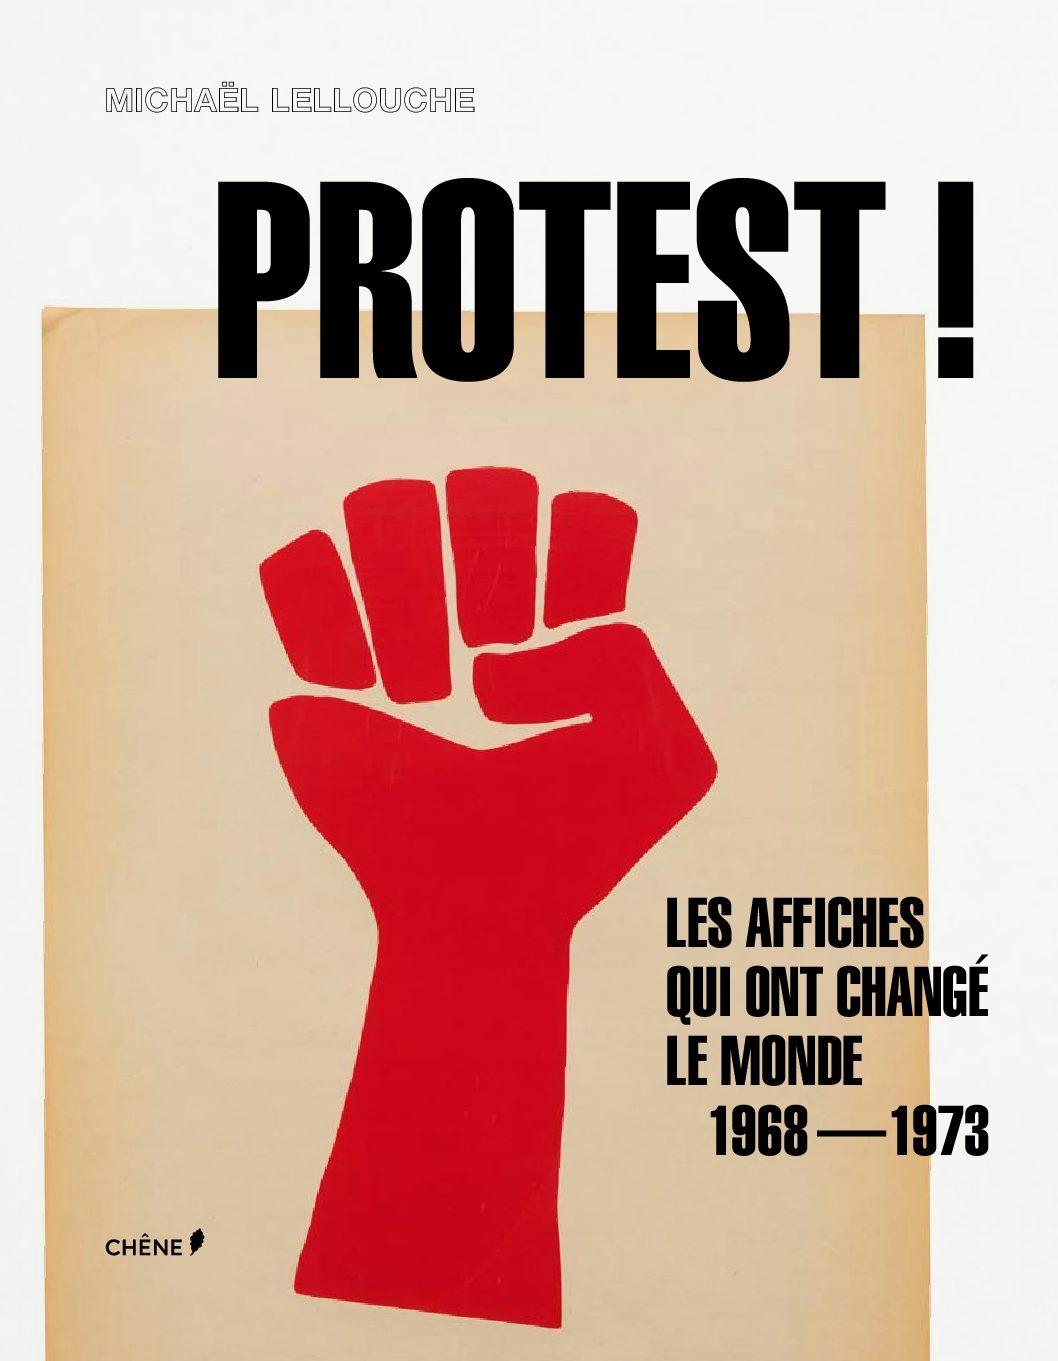 MIMA - protest-couverture 19-12-17 7